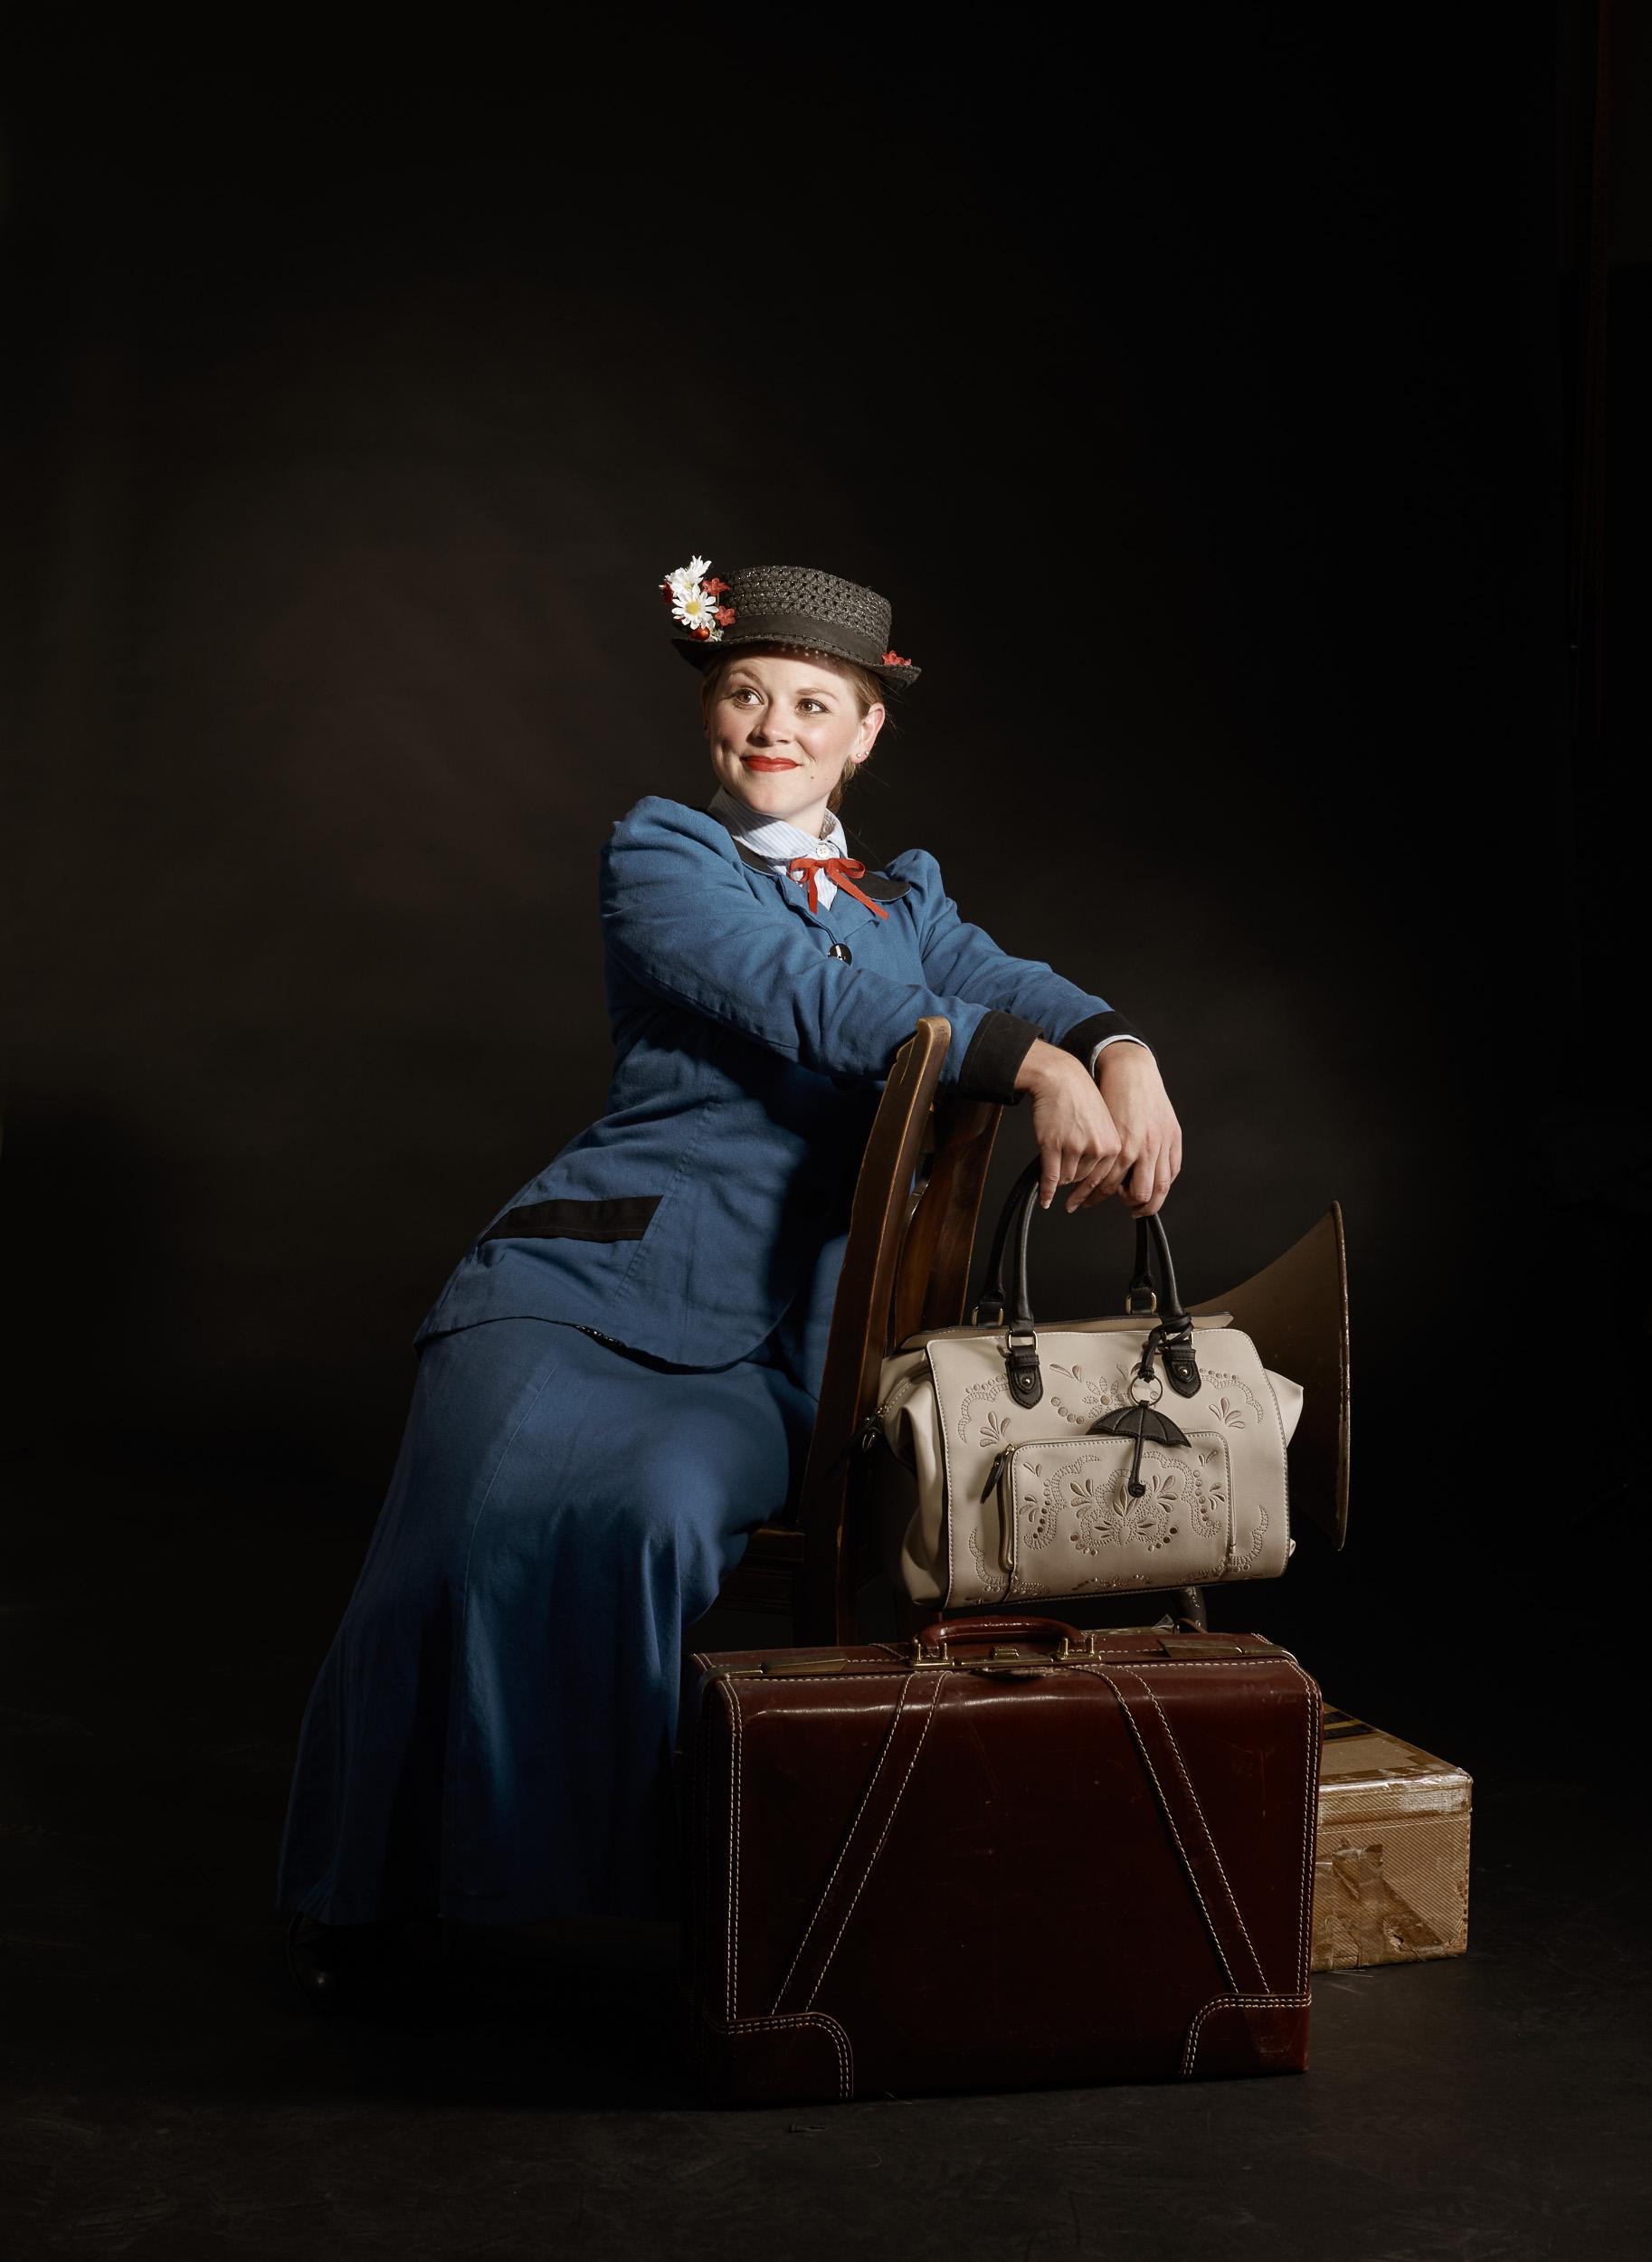 Keith Borgmeyer Photography Portraits0055.jpg